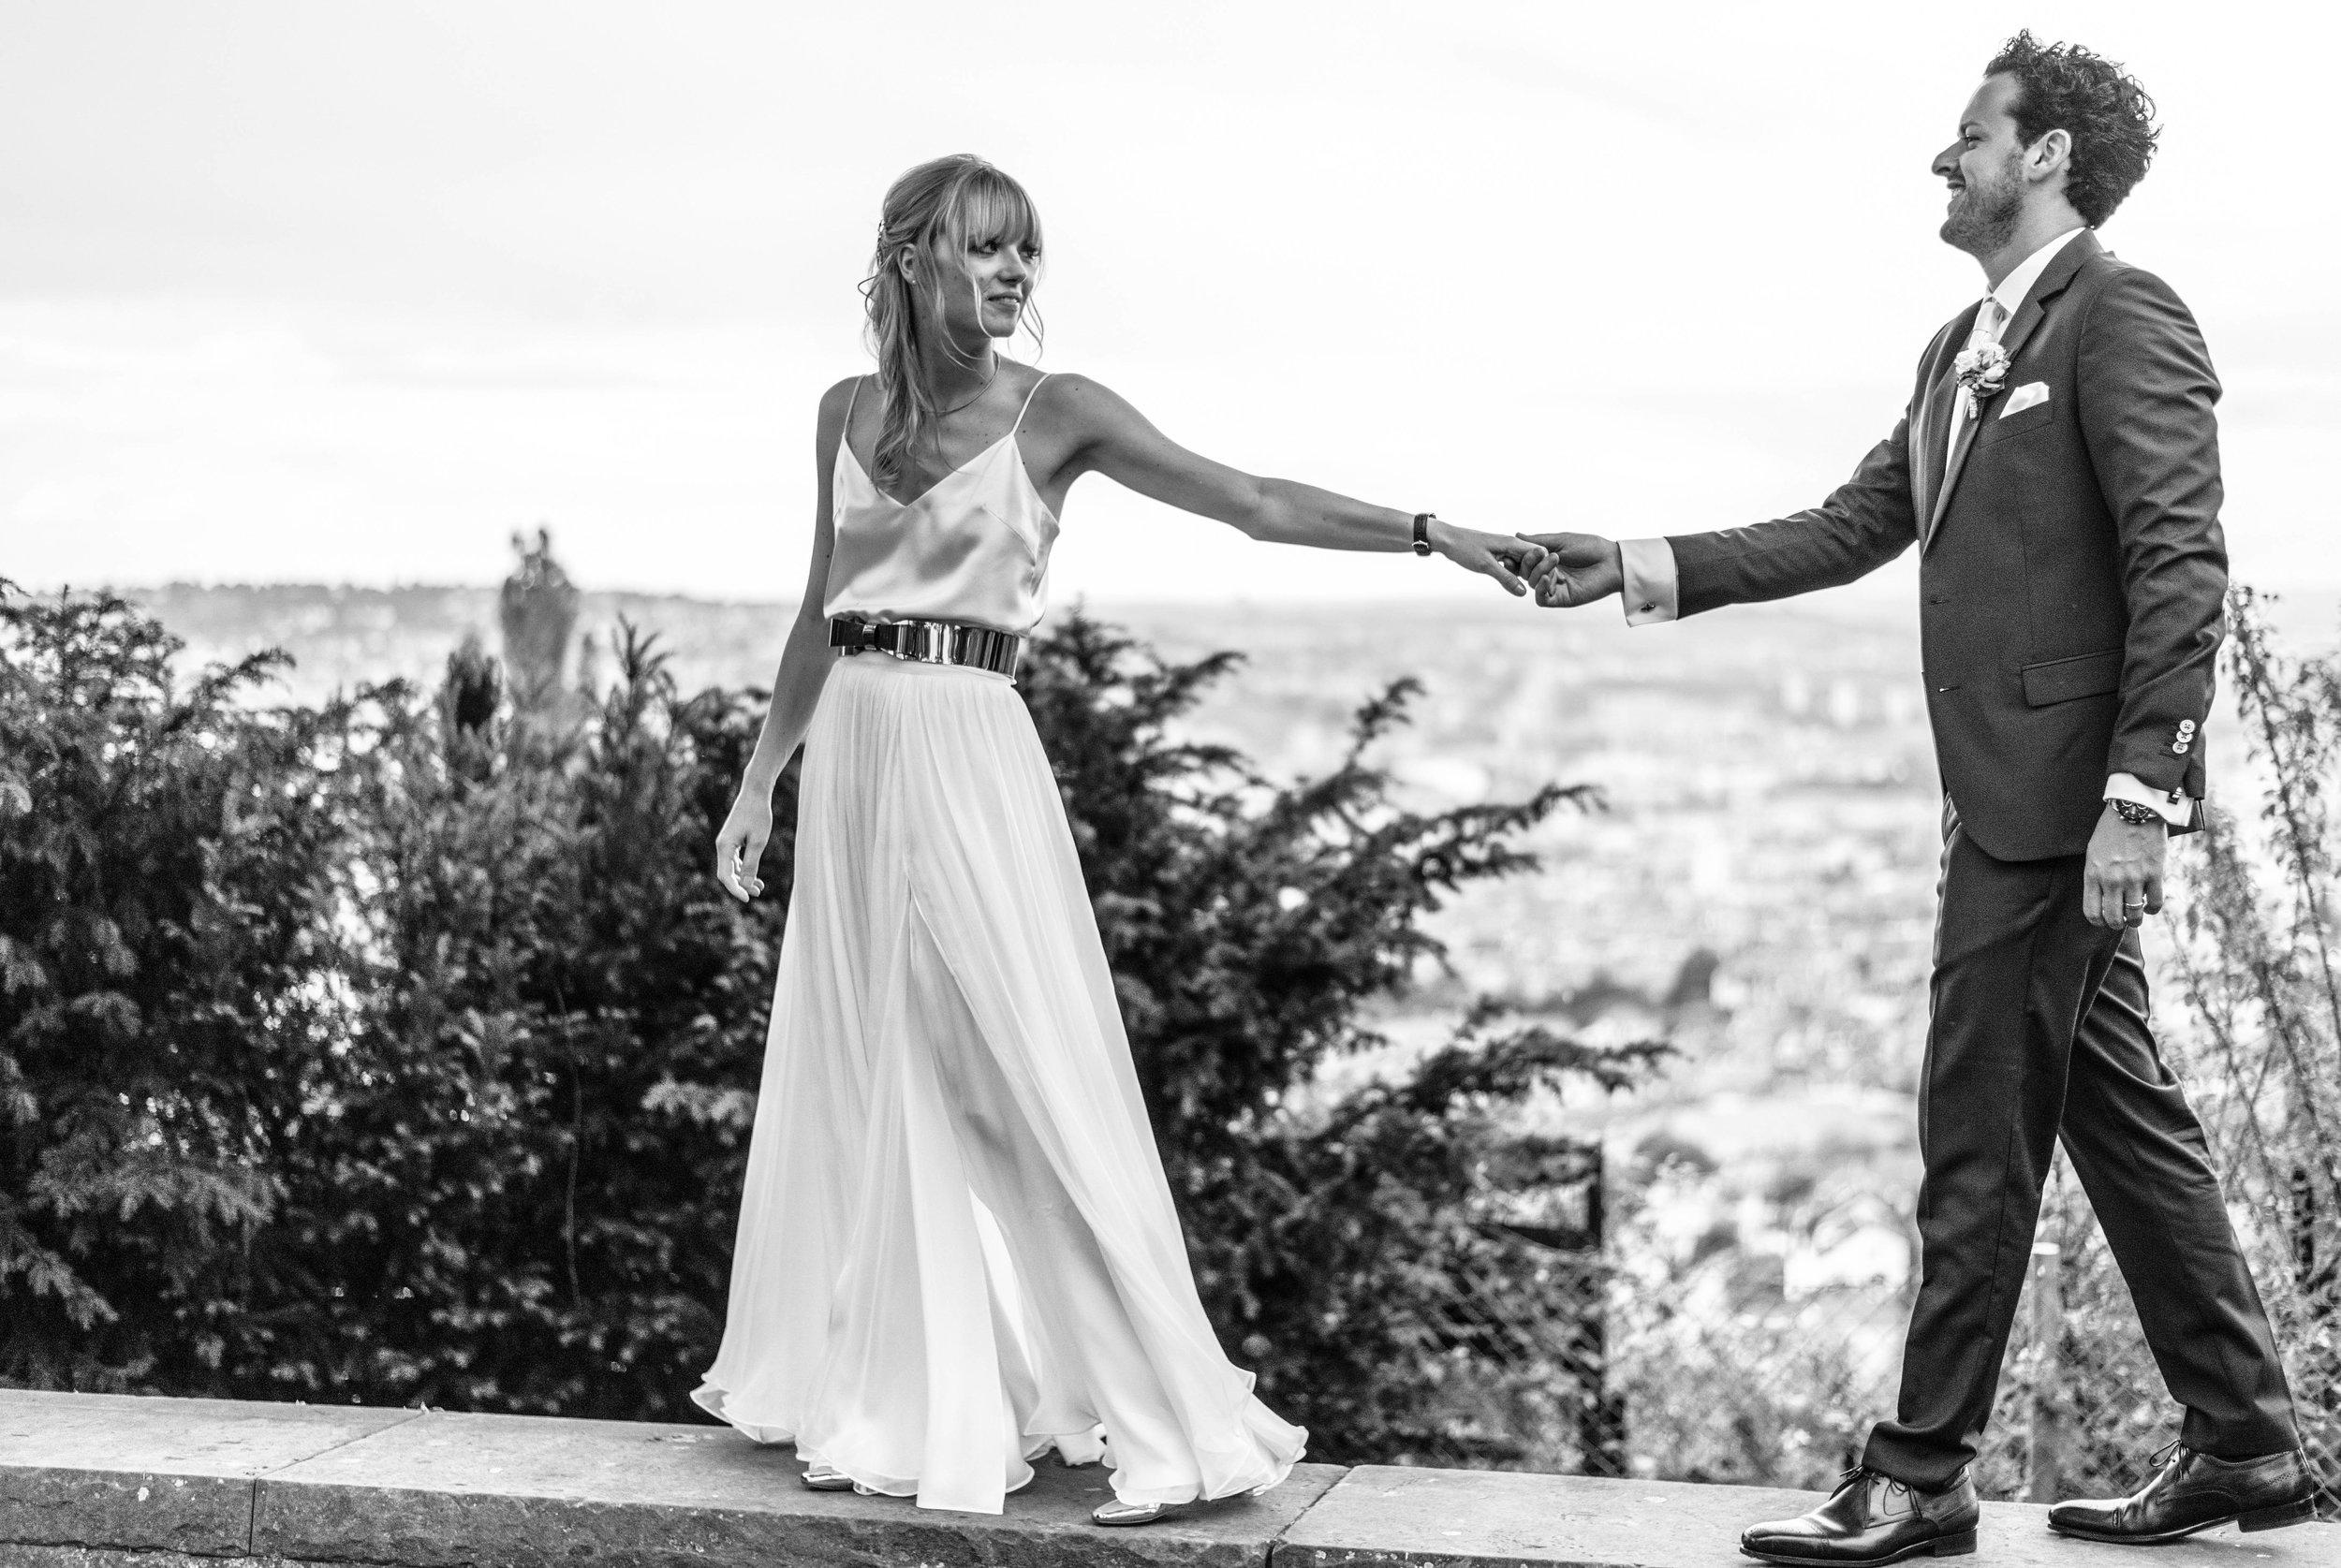 WEDDING ATTIRE -